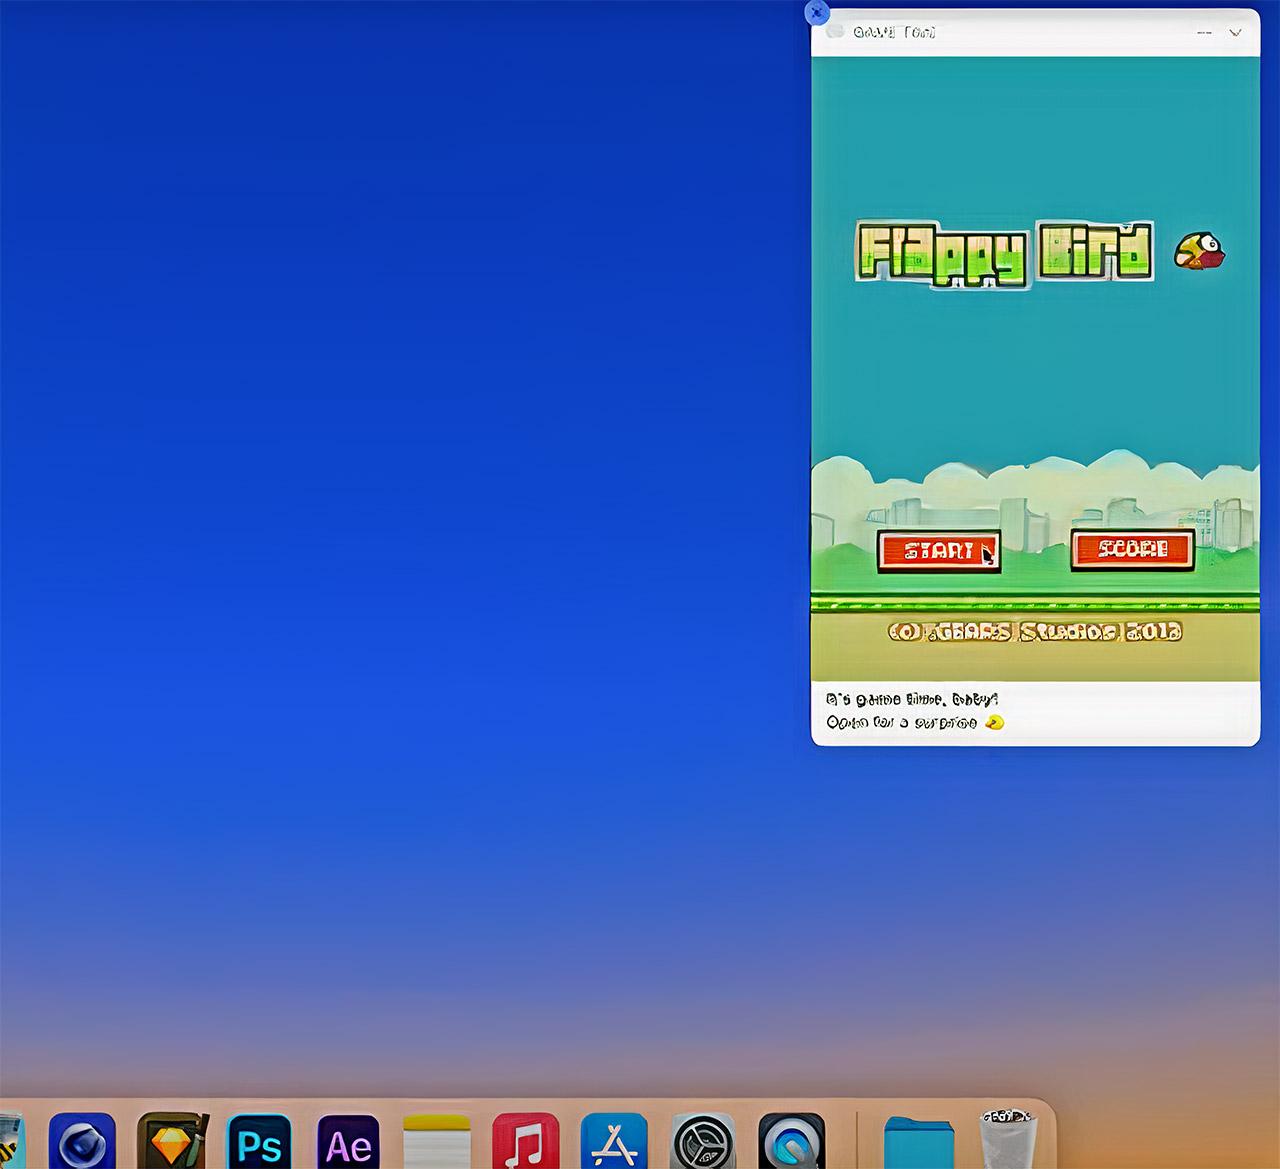 Apple macOS Notification Flappy Bird Game